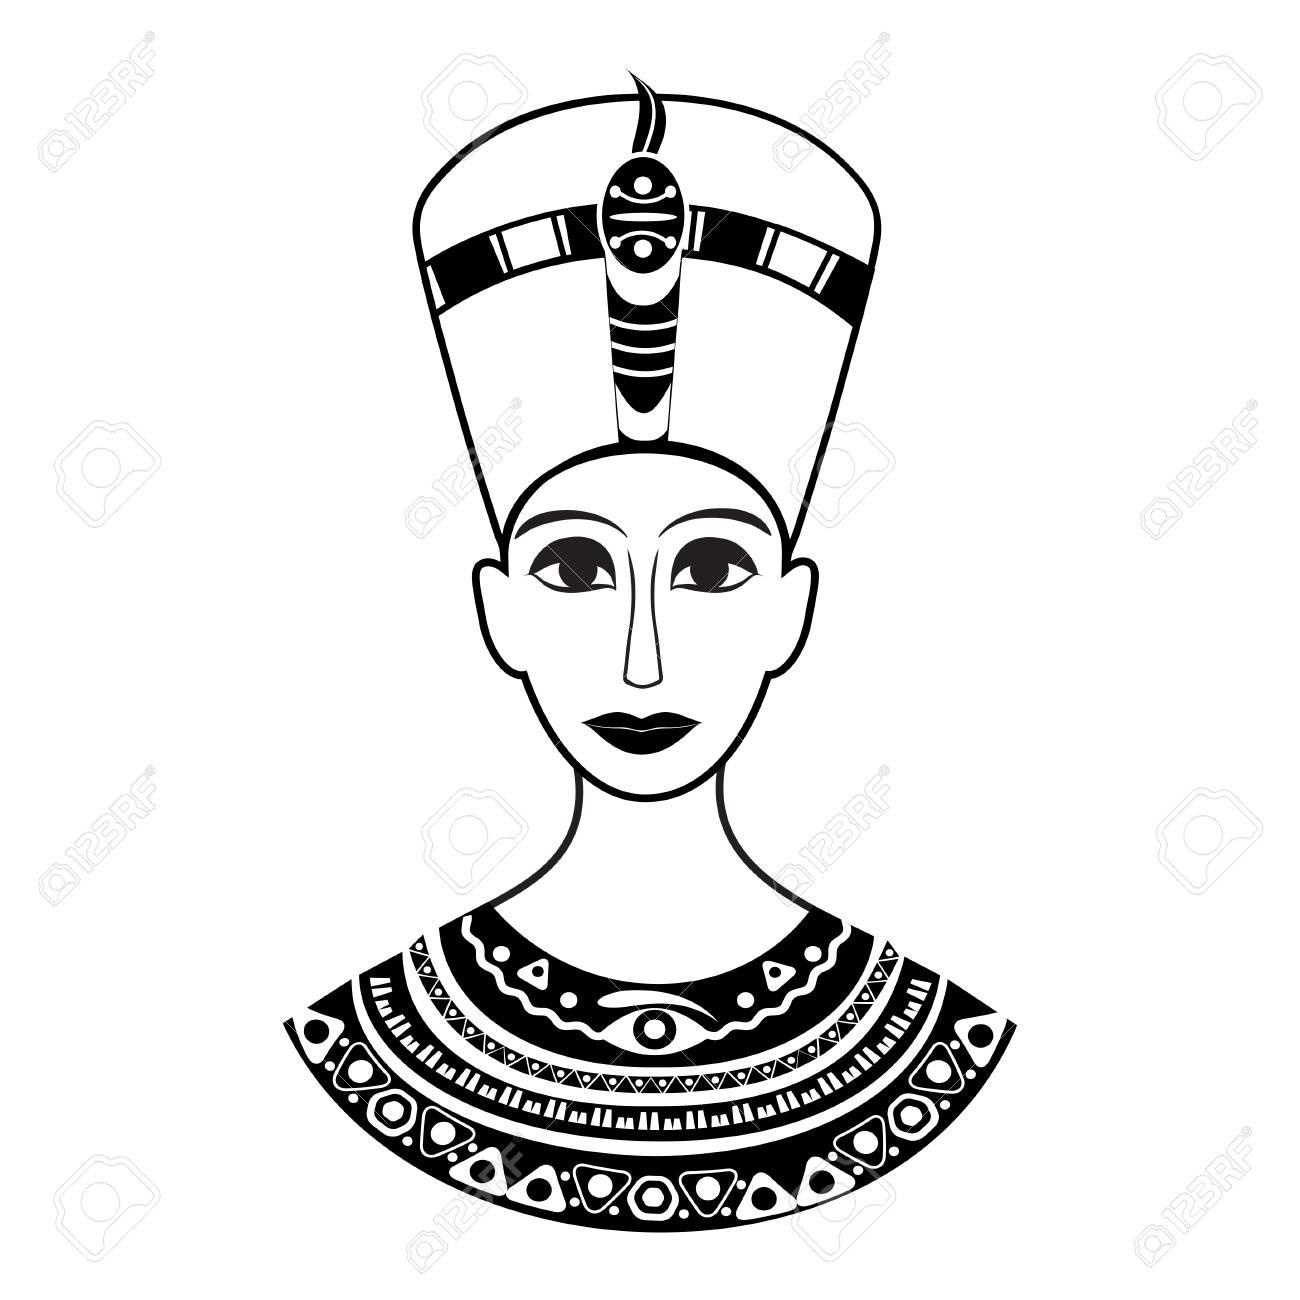 1300x1300 The Bust Of The Ancient Egyptian Pharaoh Cleopatra Or Nefertiti